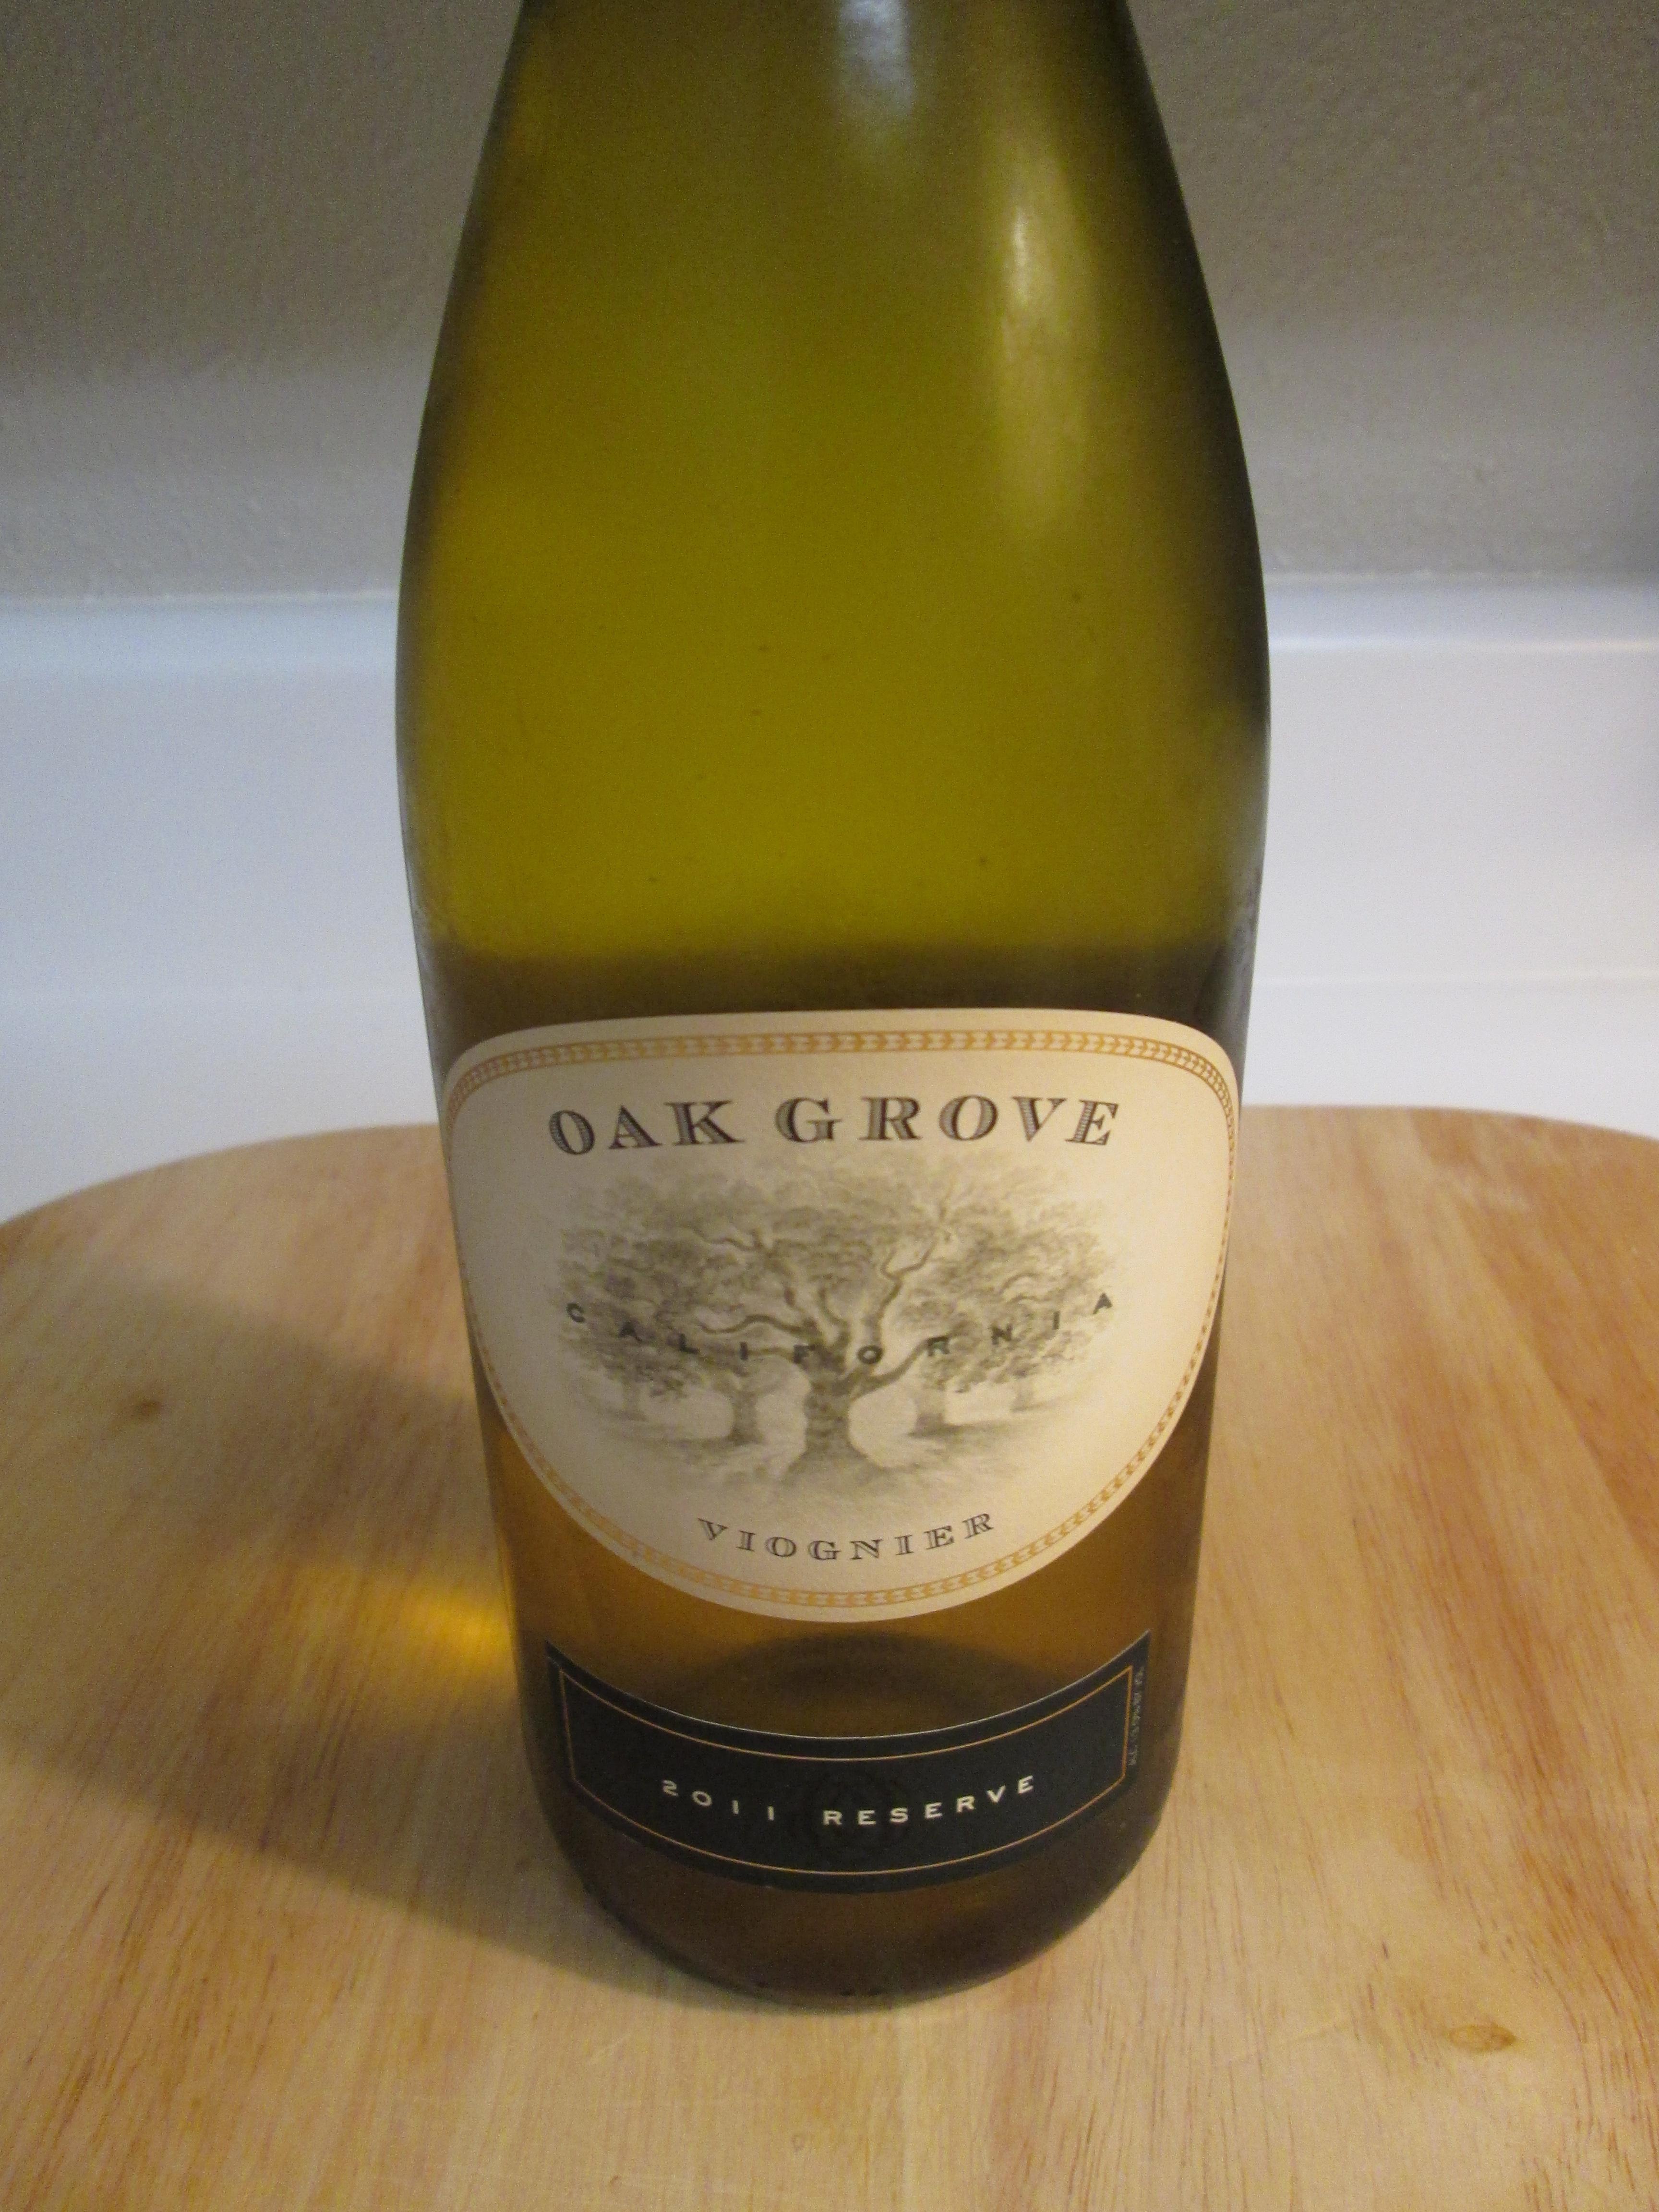 2011 Oak Grove Reserve Viognier